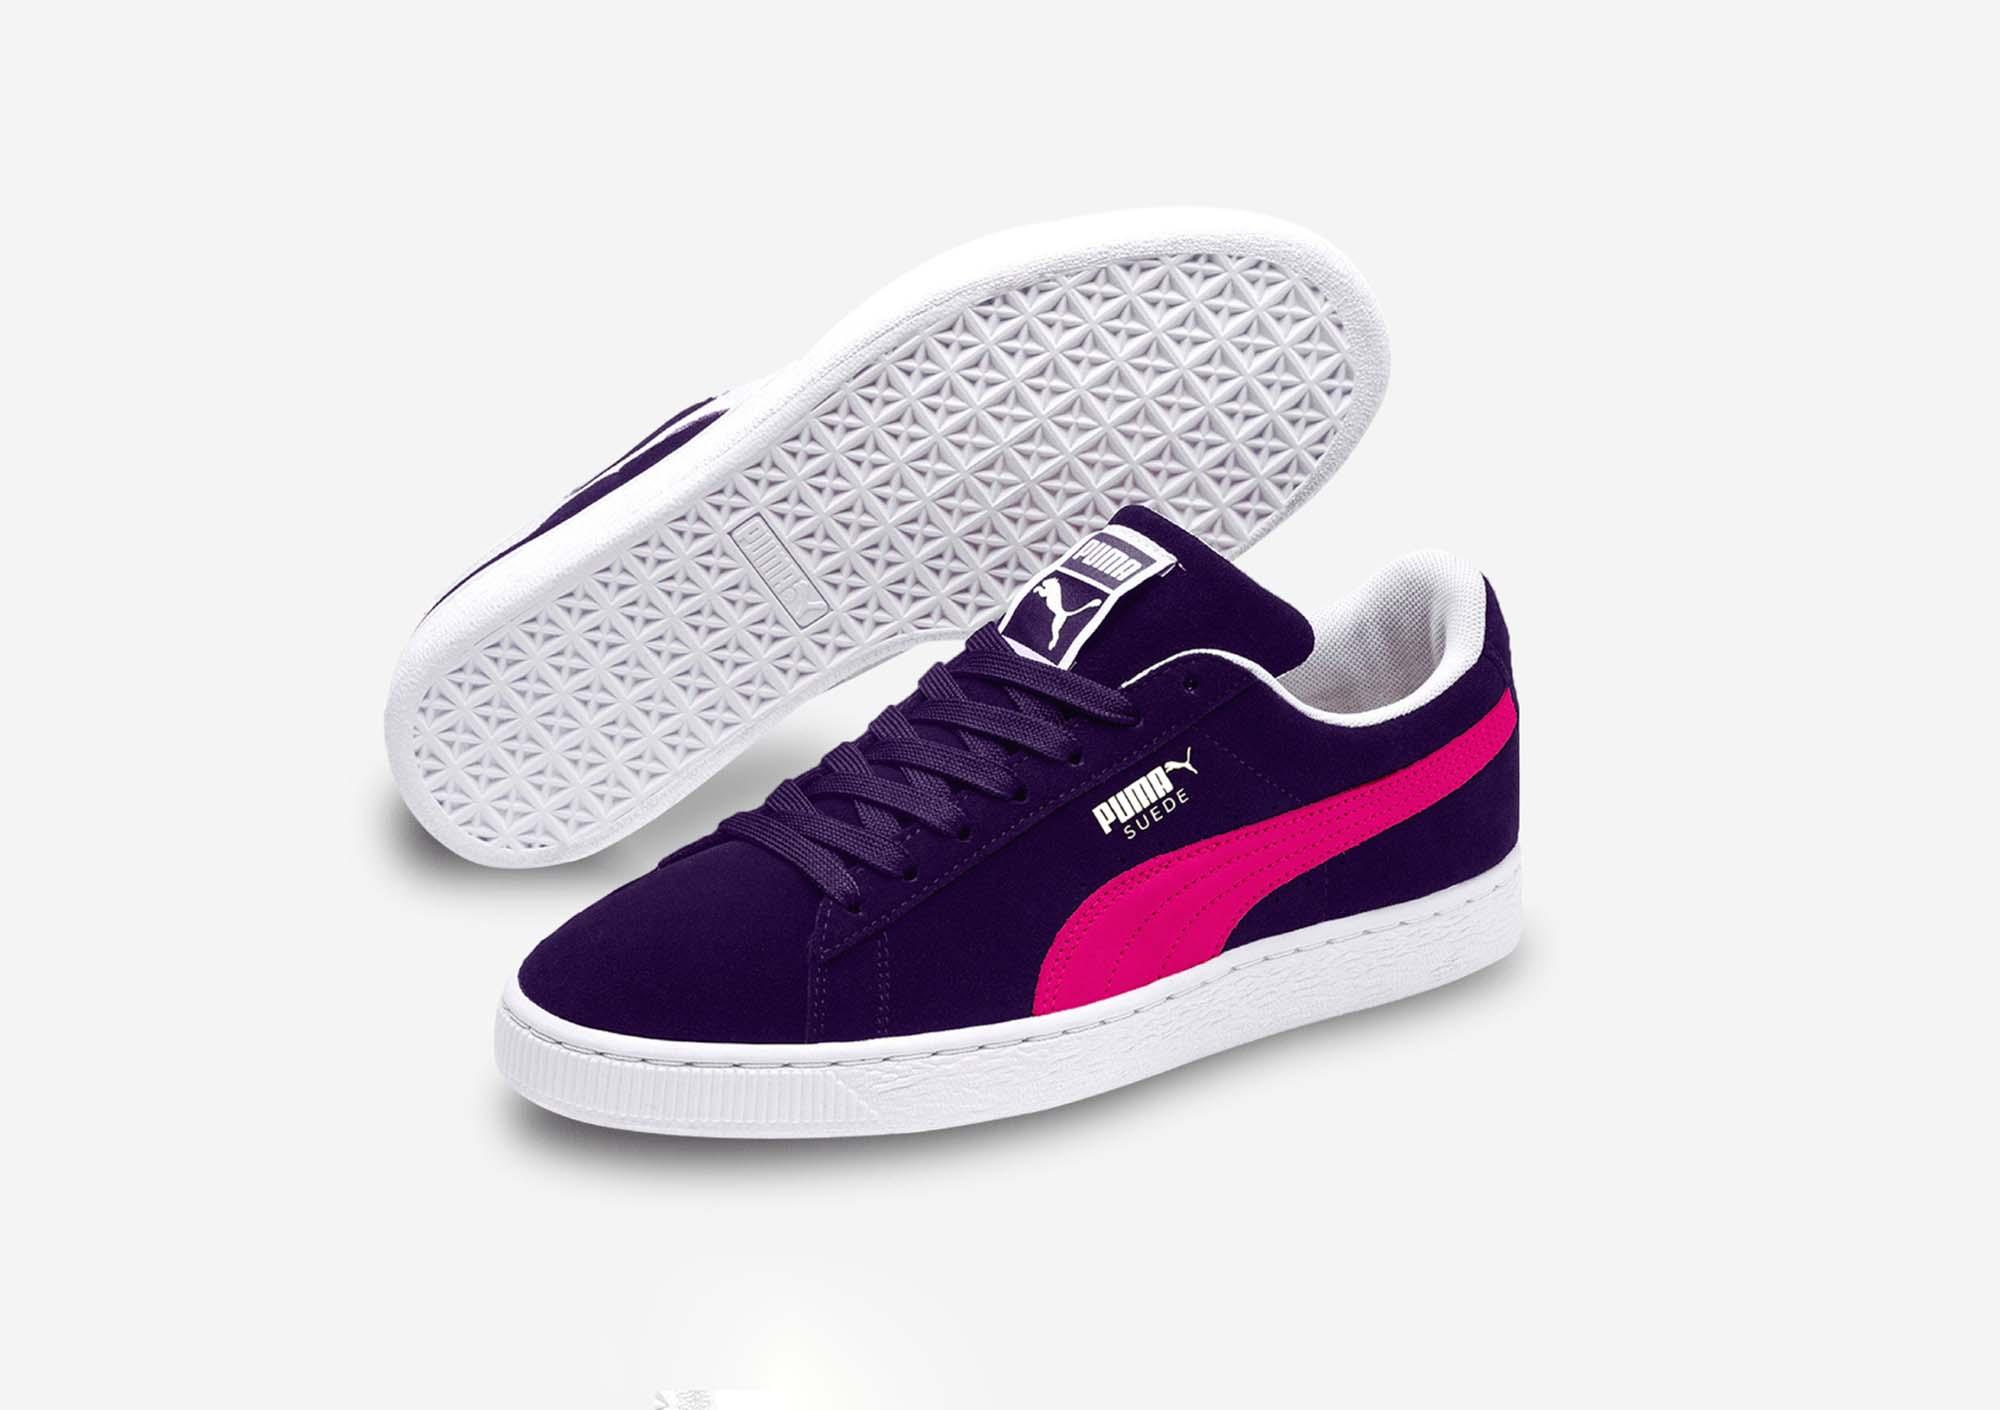 Shoes Apparel Mockup